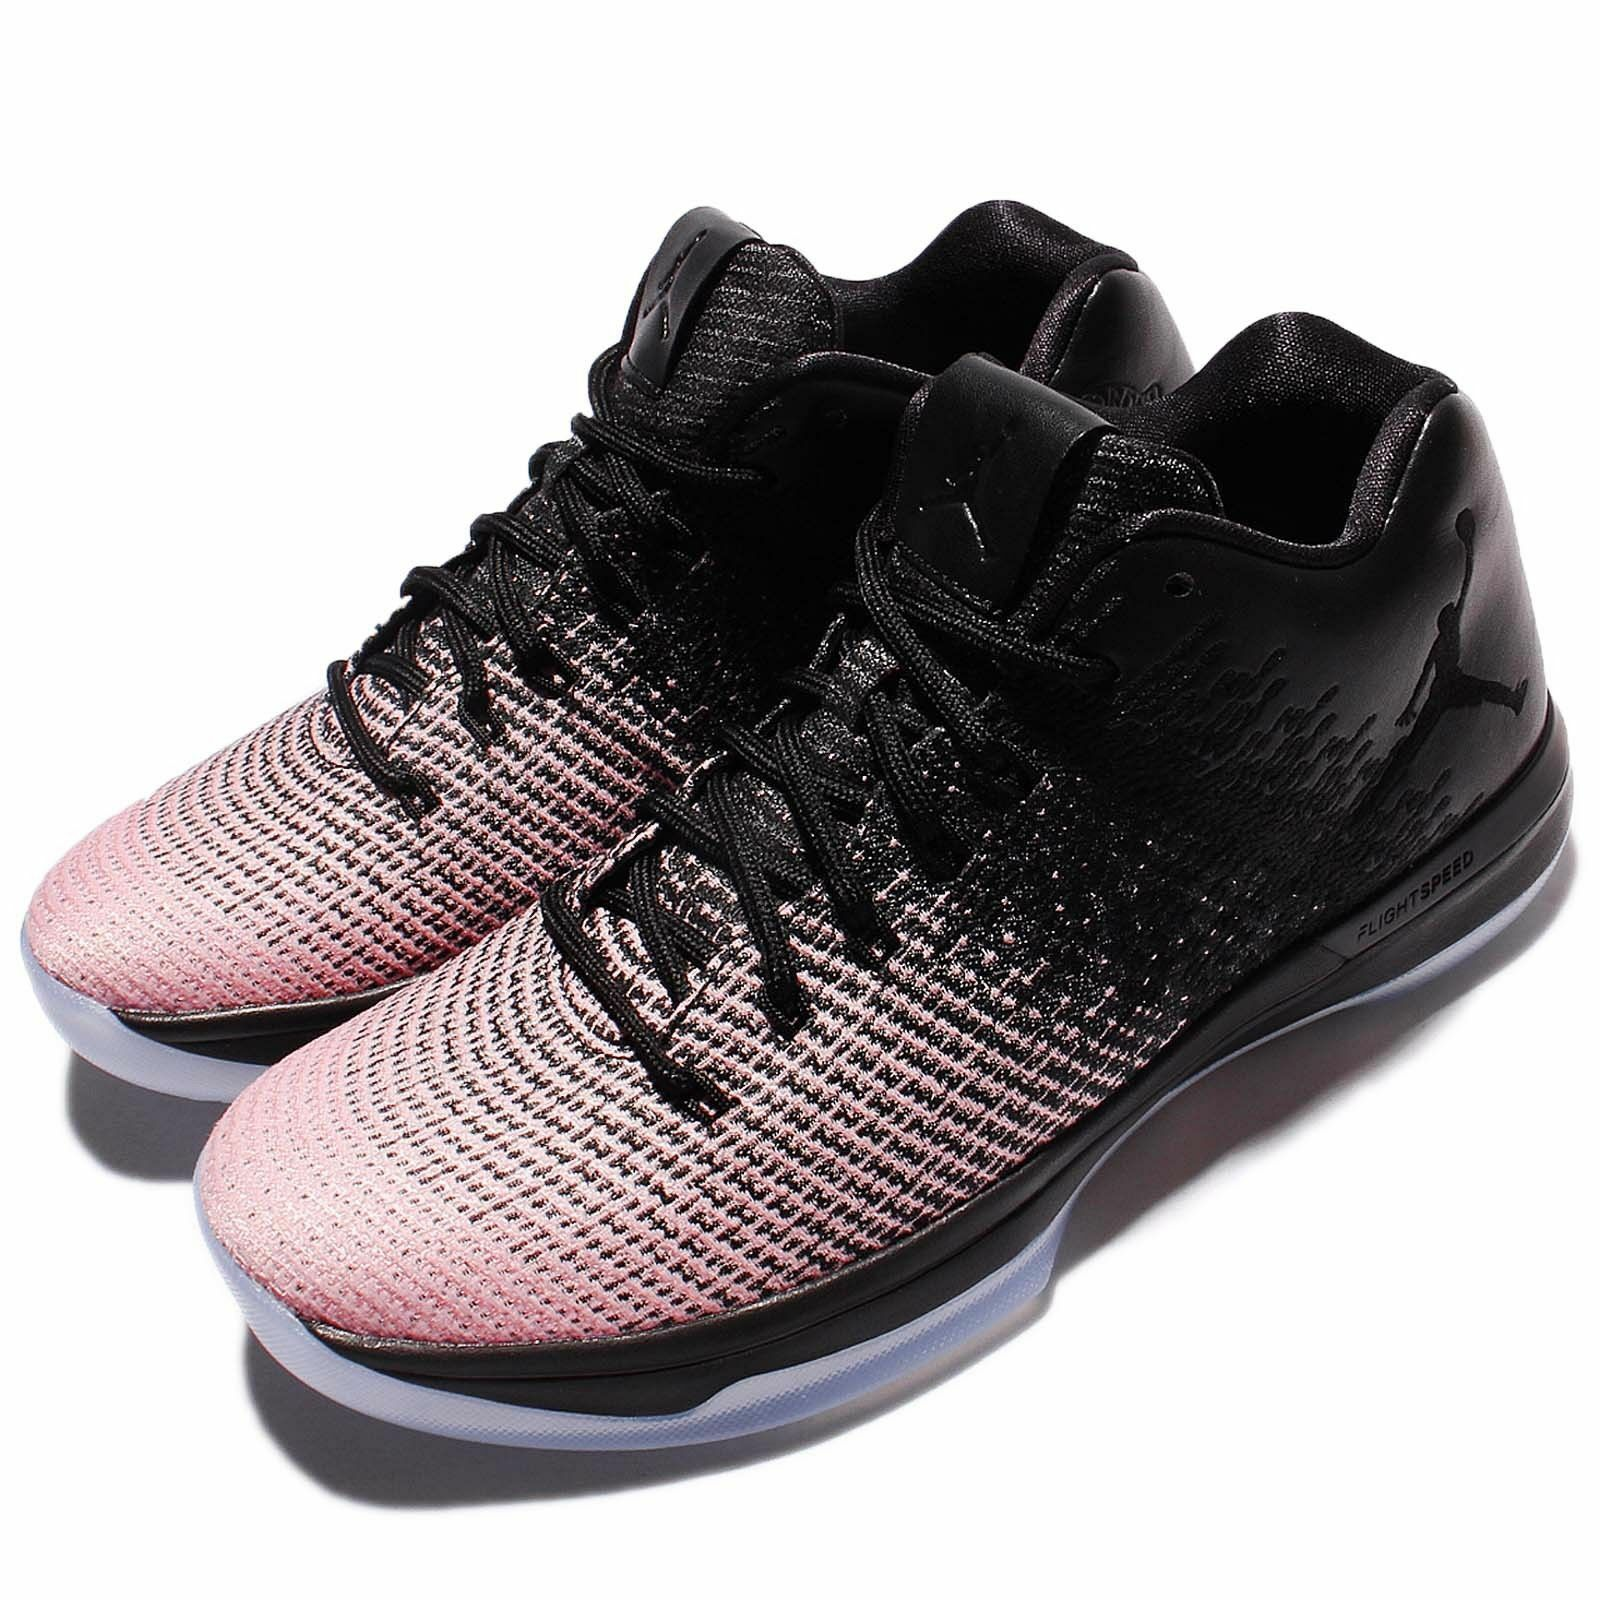 Air Jordan XXXI 31 Low Size 10 US Black Men's Shoes AJ31